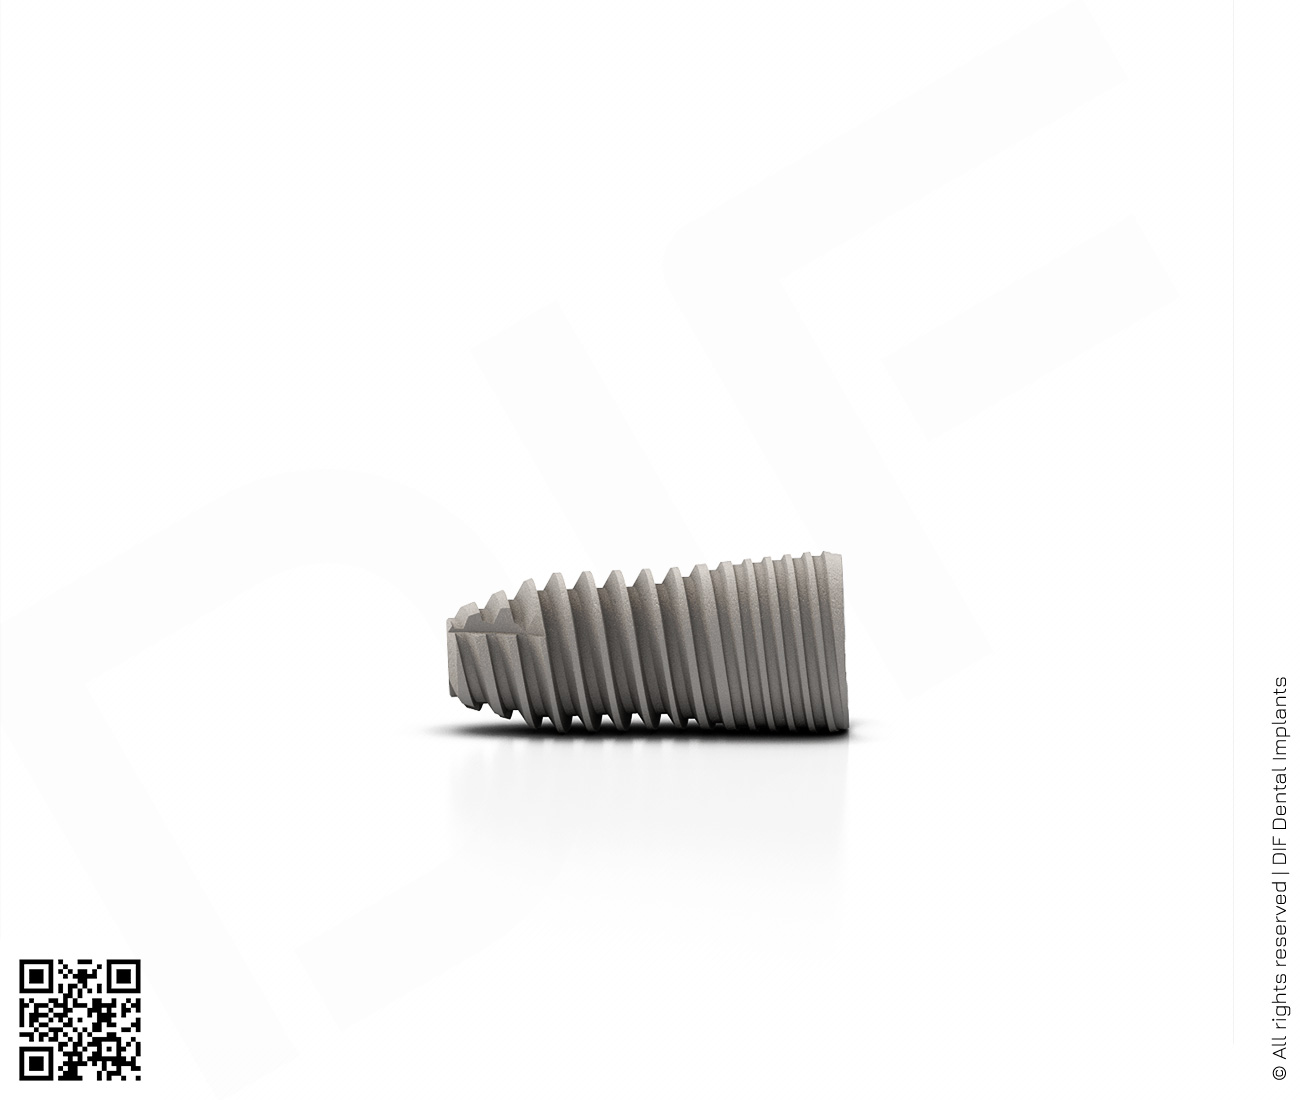 Фото имплантат mainstream fine d3.75 мм – l8.0 мм  производства DIF.